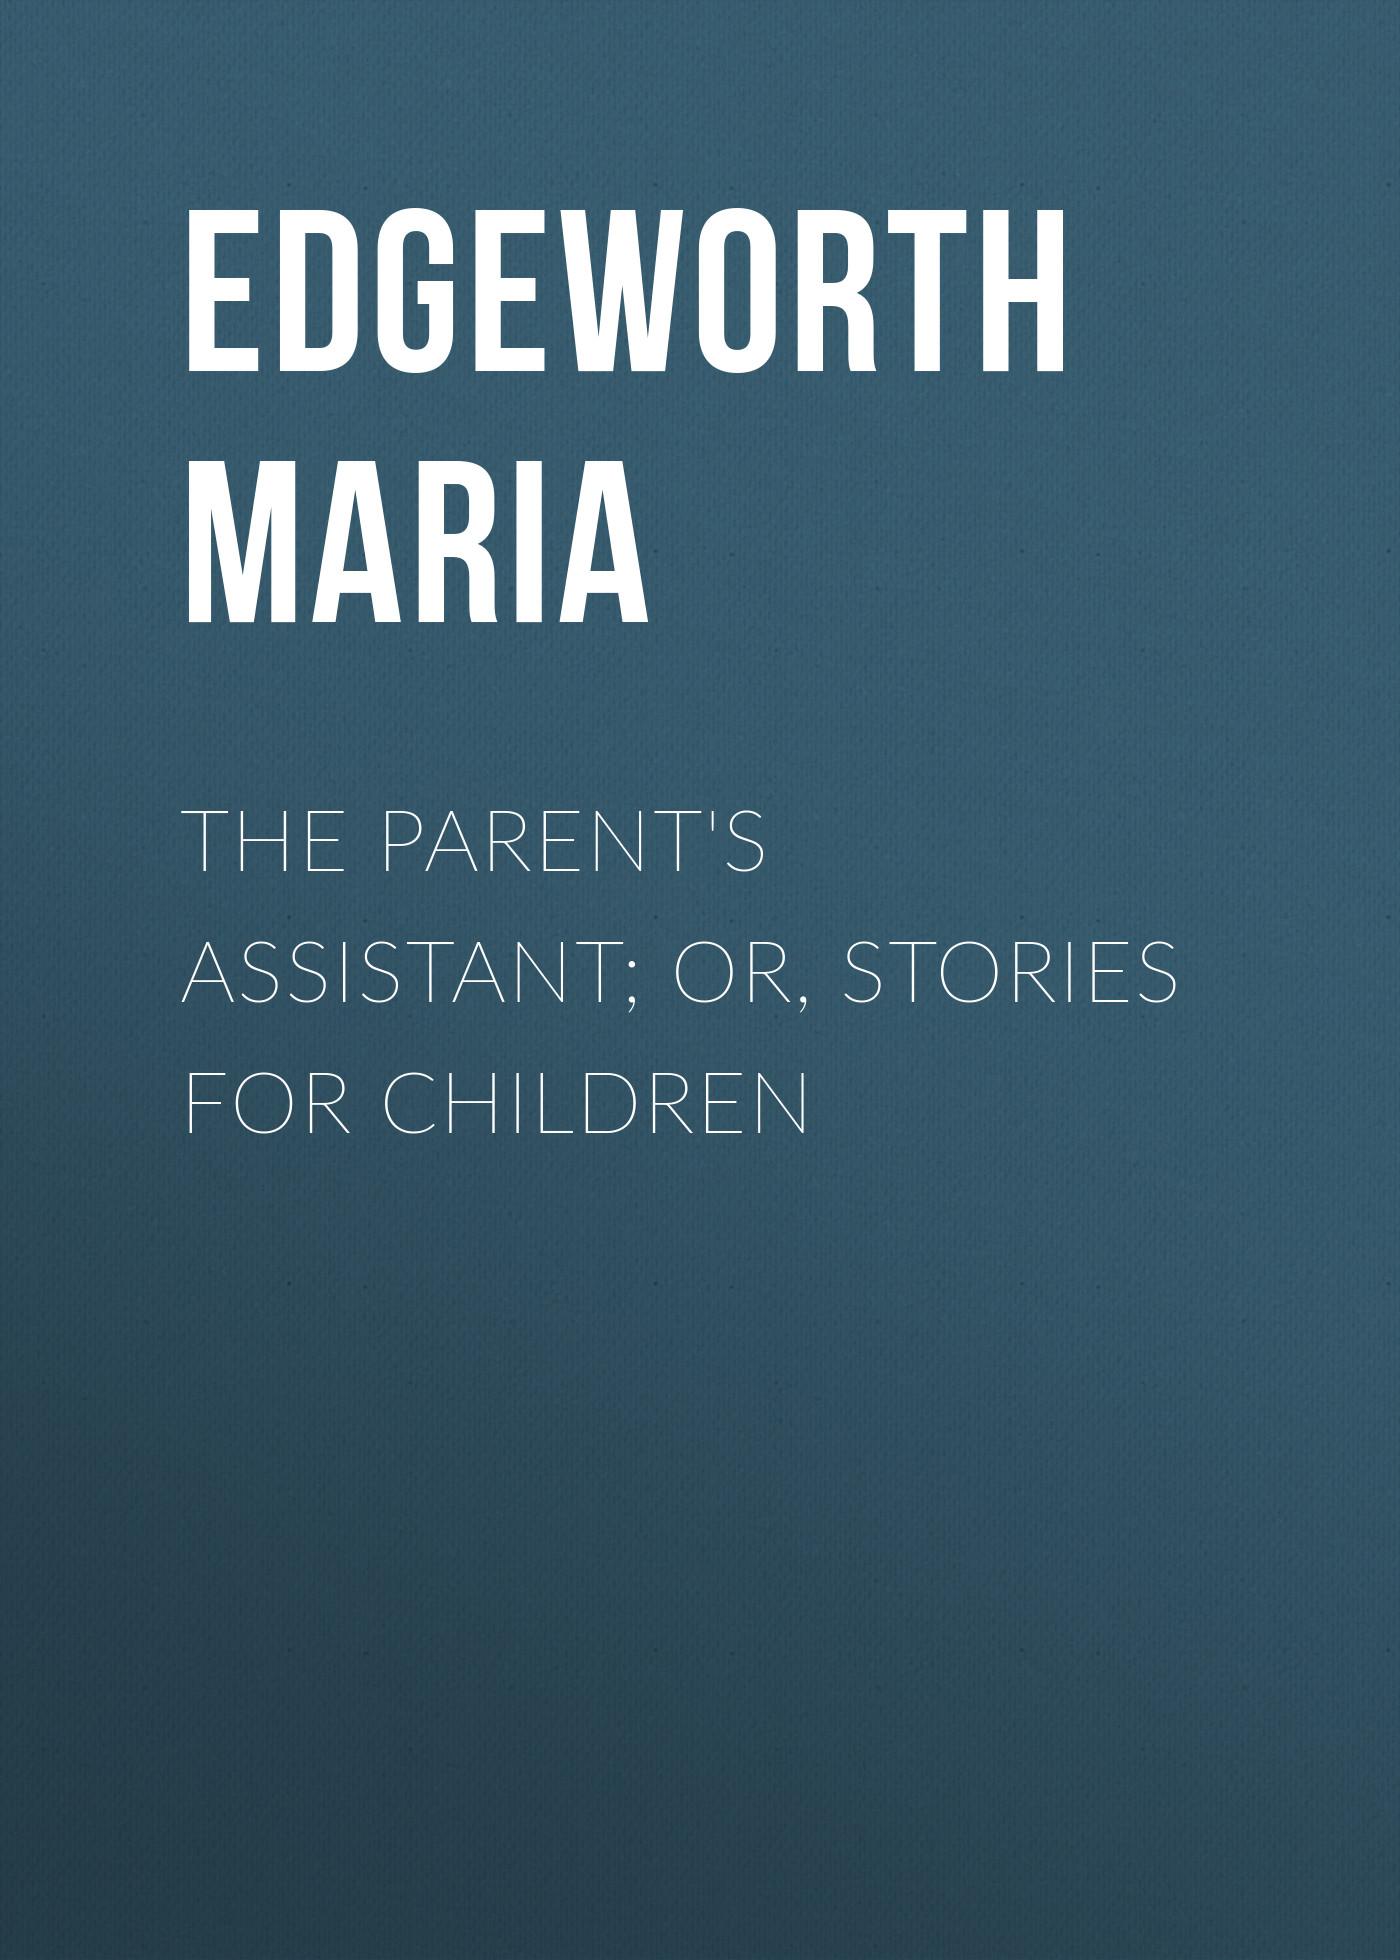 Edgeworth Maria The Parent's Assistant; Or, Stories for Children vitaly mushkin erotic stories top ten